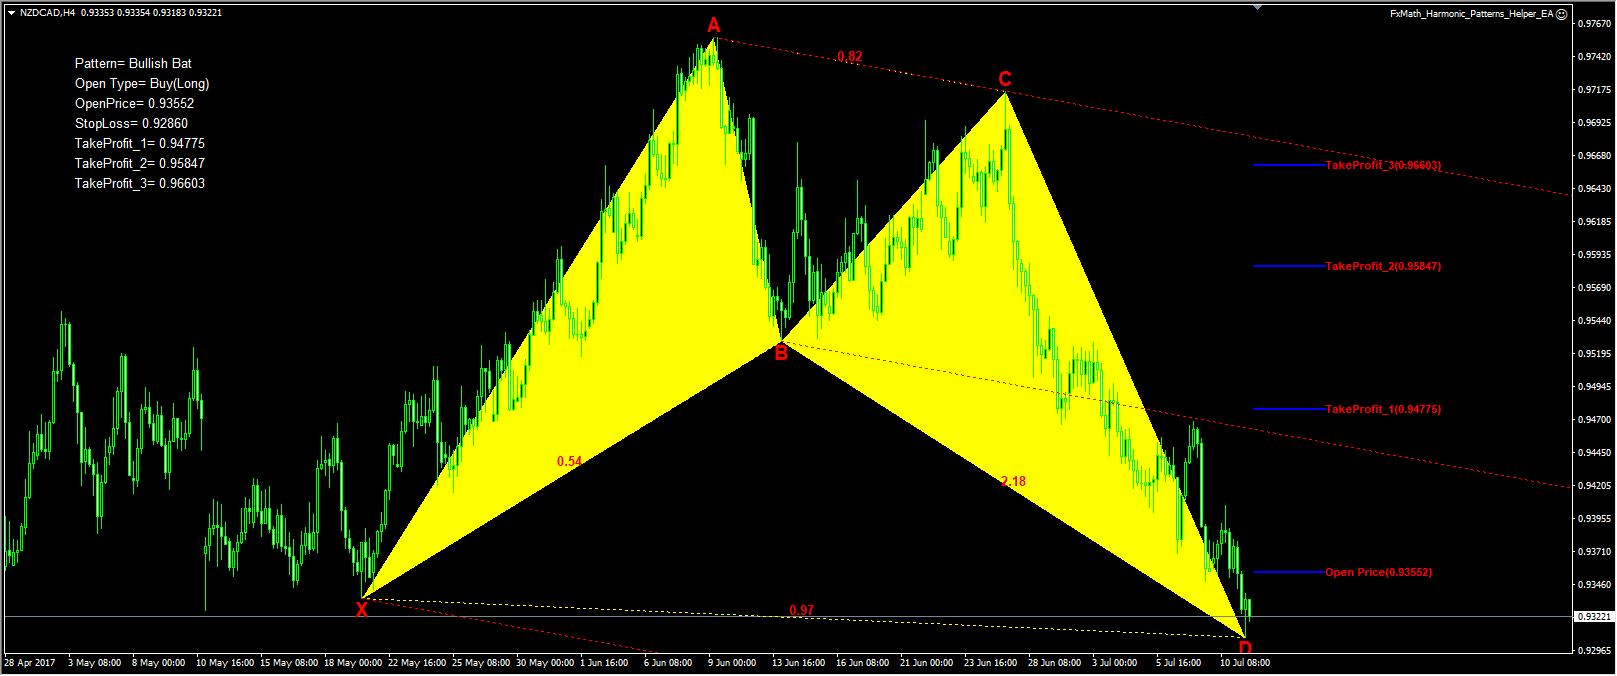 Fxmath Harmonic Patterns Scanner 1 Fxmath Financial Solution